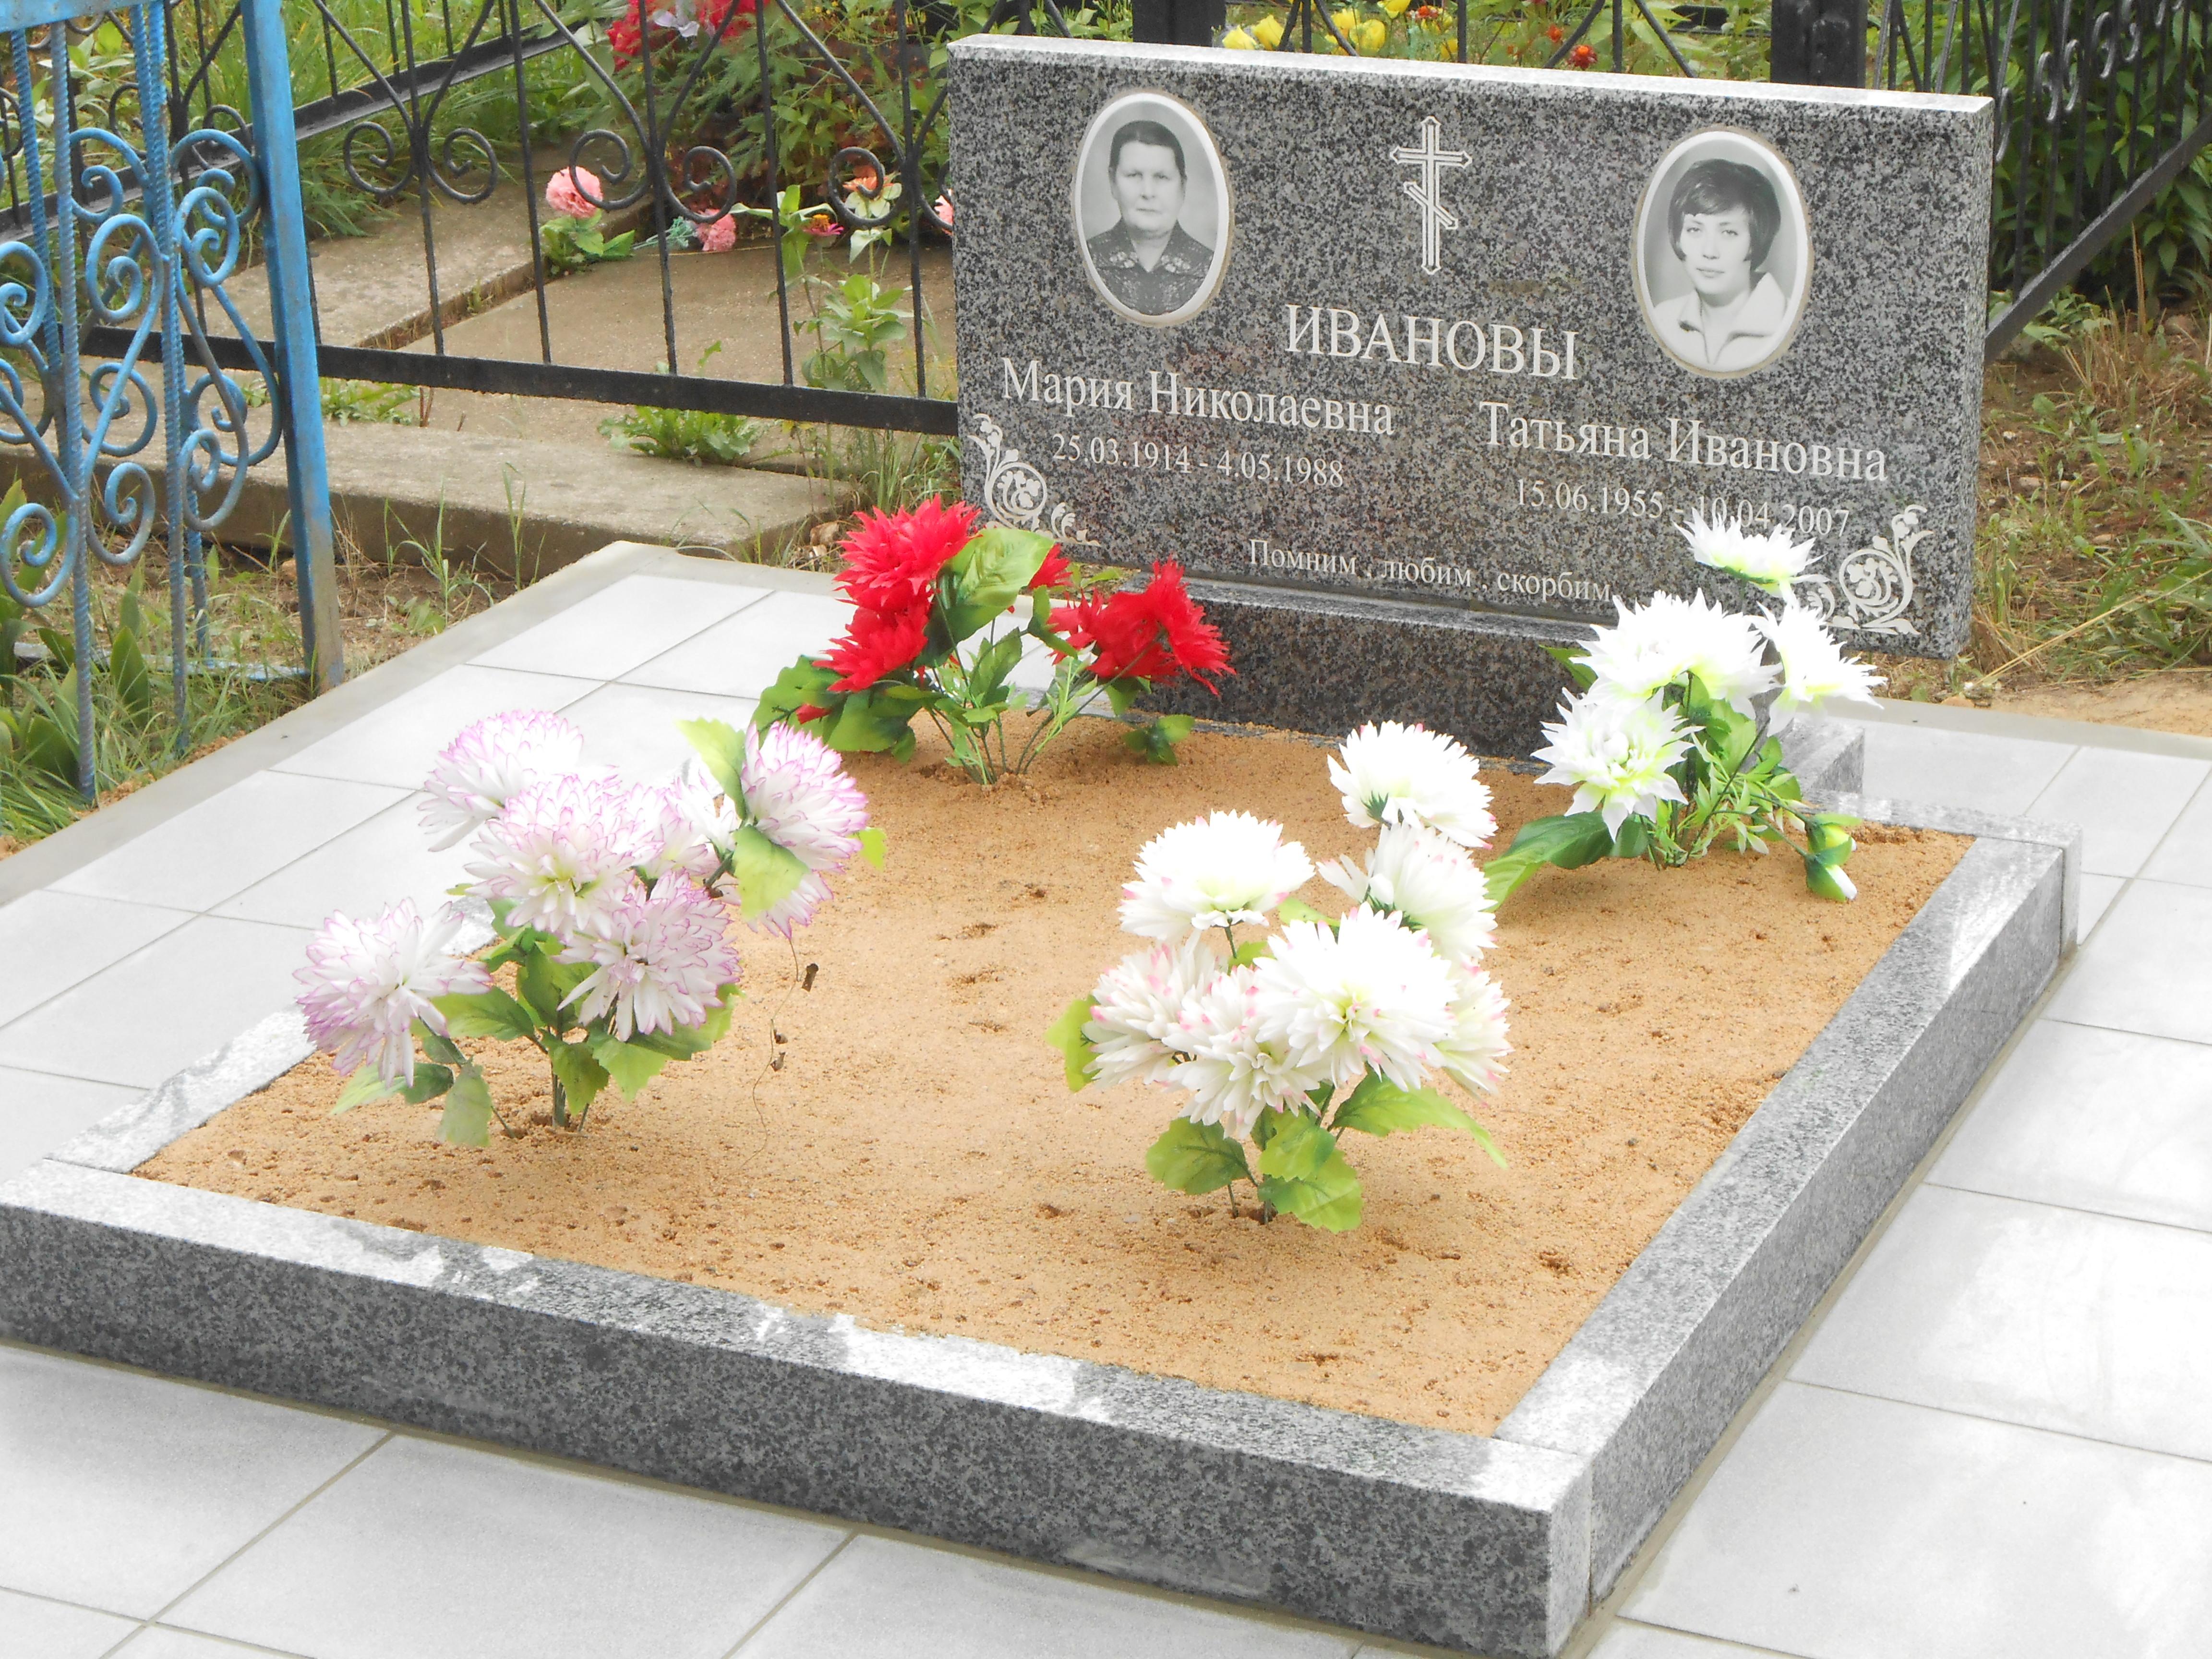 Ivanovy2